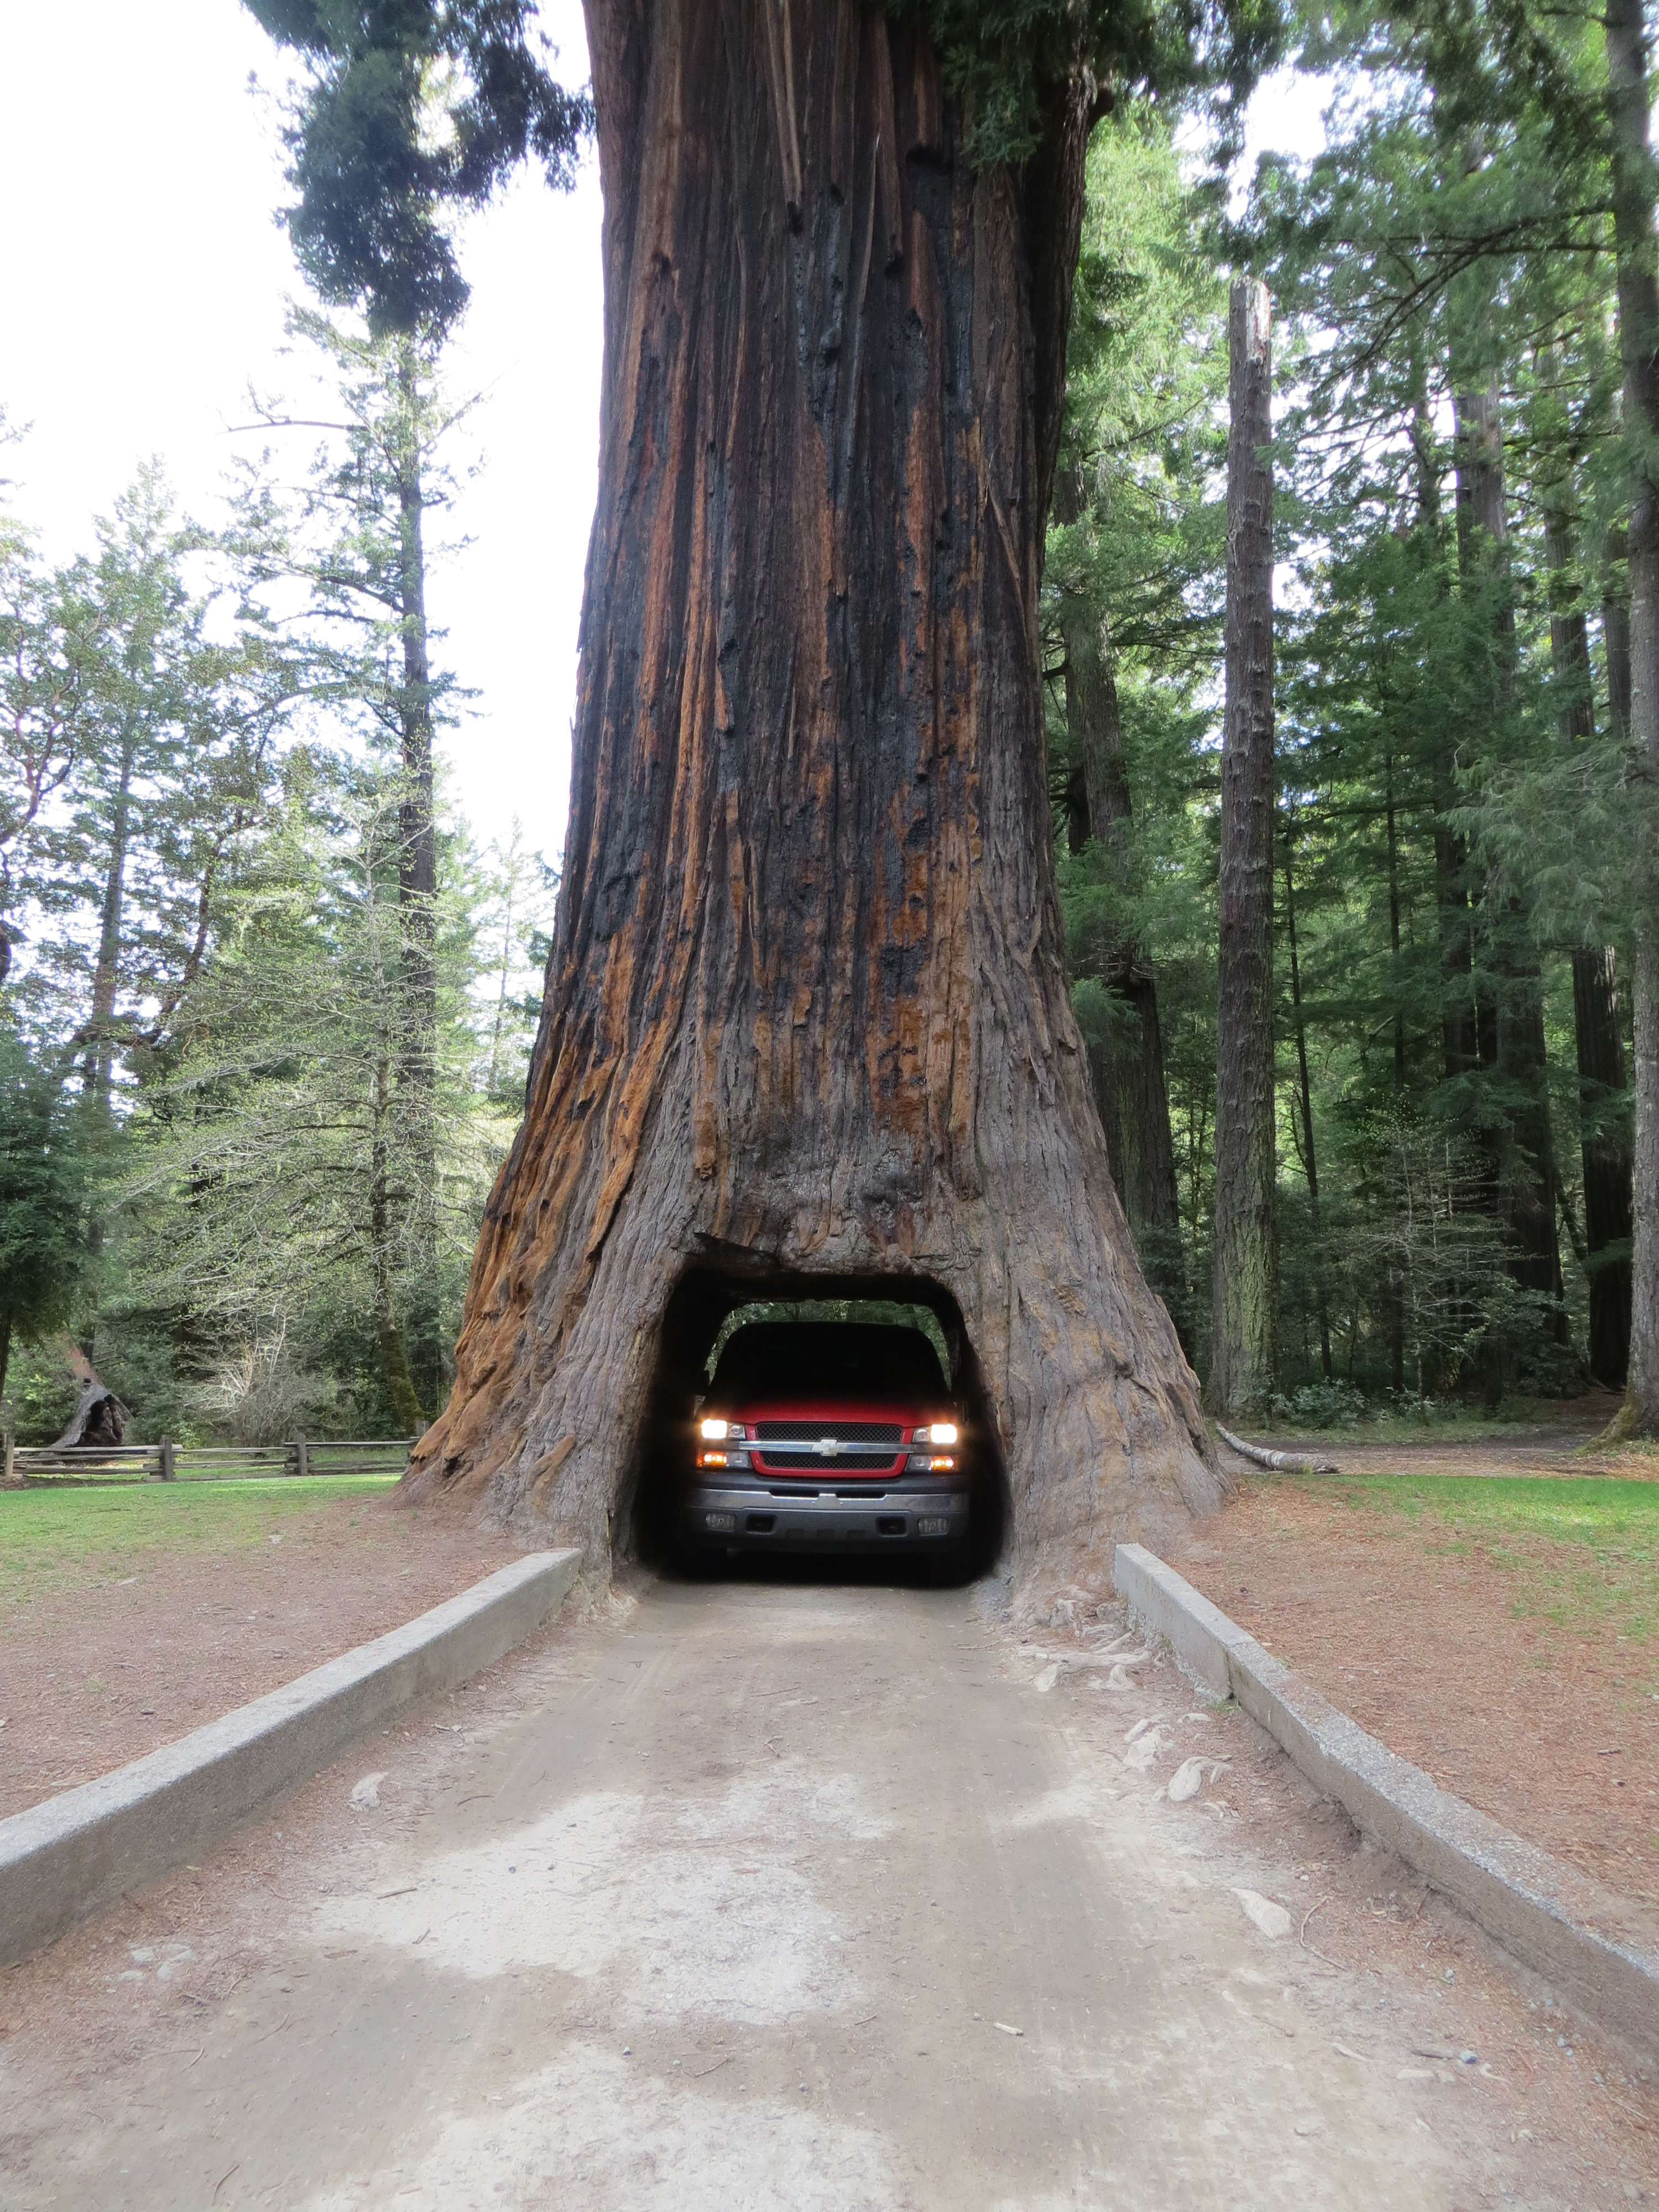 Chandelier Drive-Thru Tree | Smoking Brakes